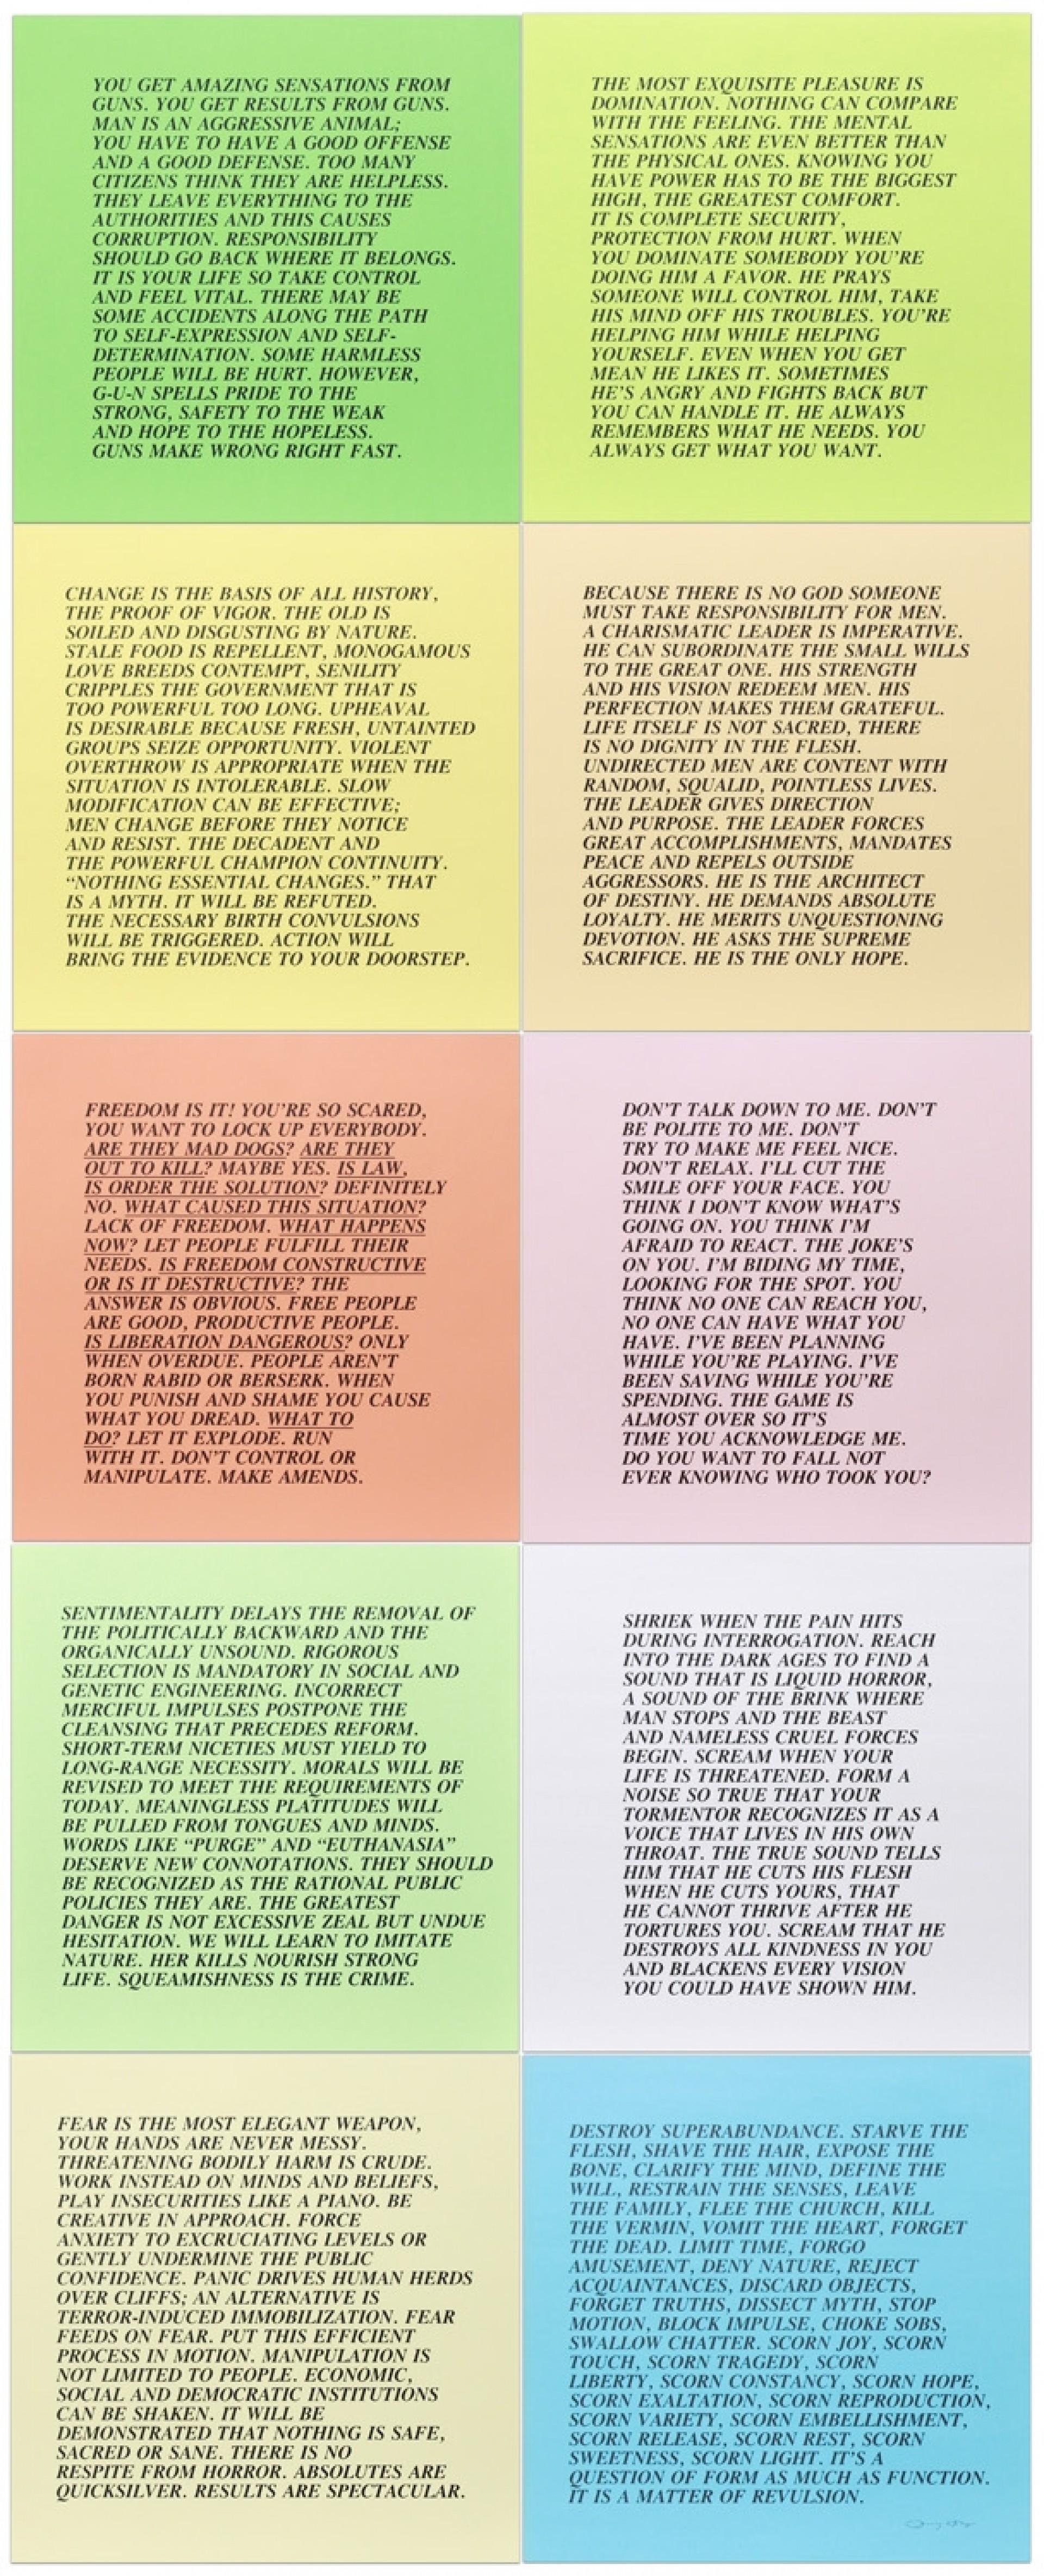 008 Inflammatory Essays Essay Remarkable Poster Shirt 1920